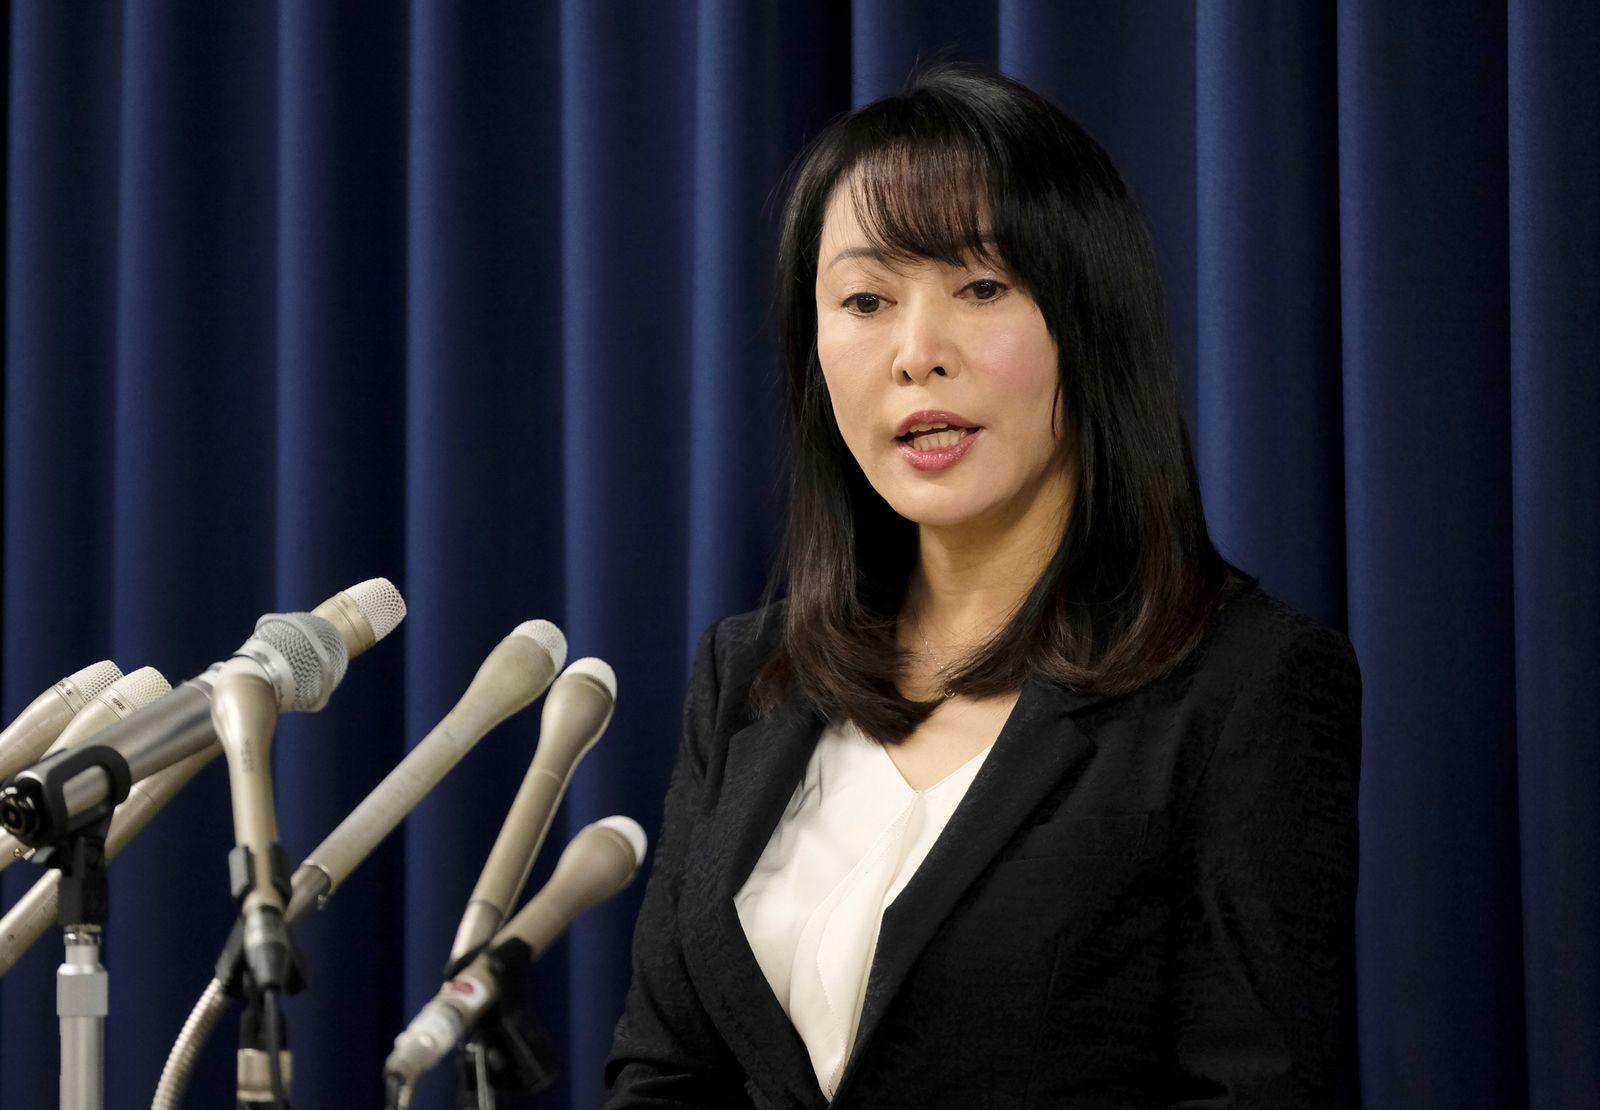 Masako Mori/ Justizministerin Japan